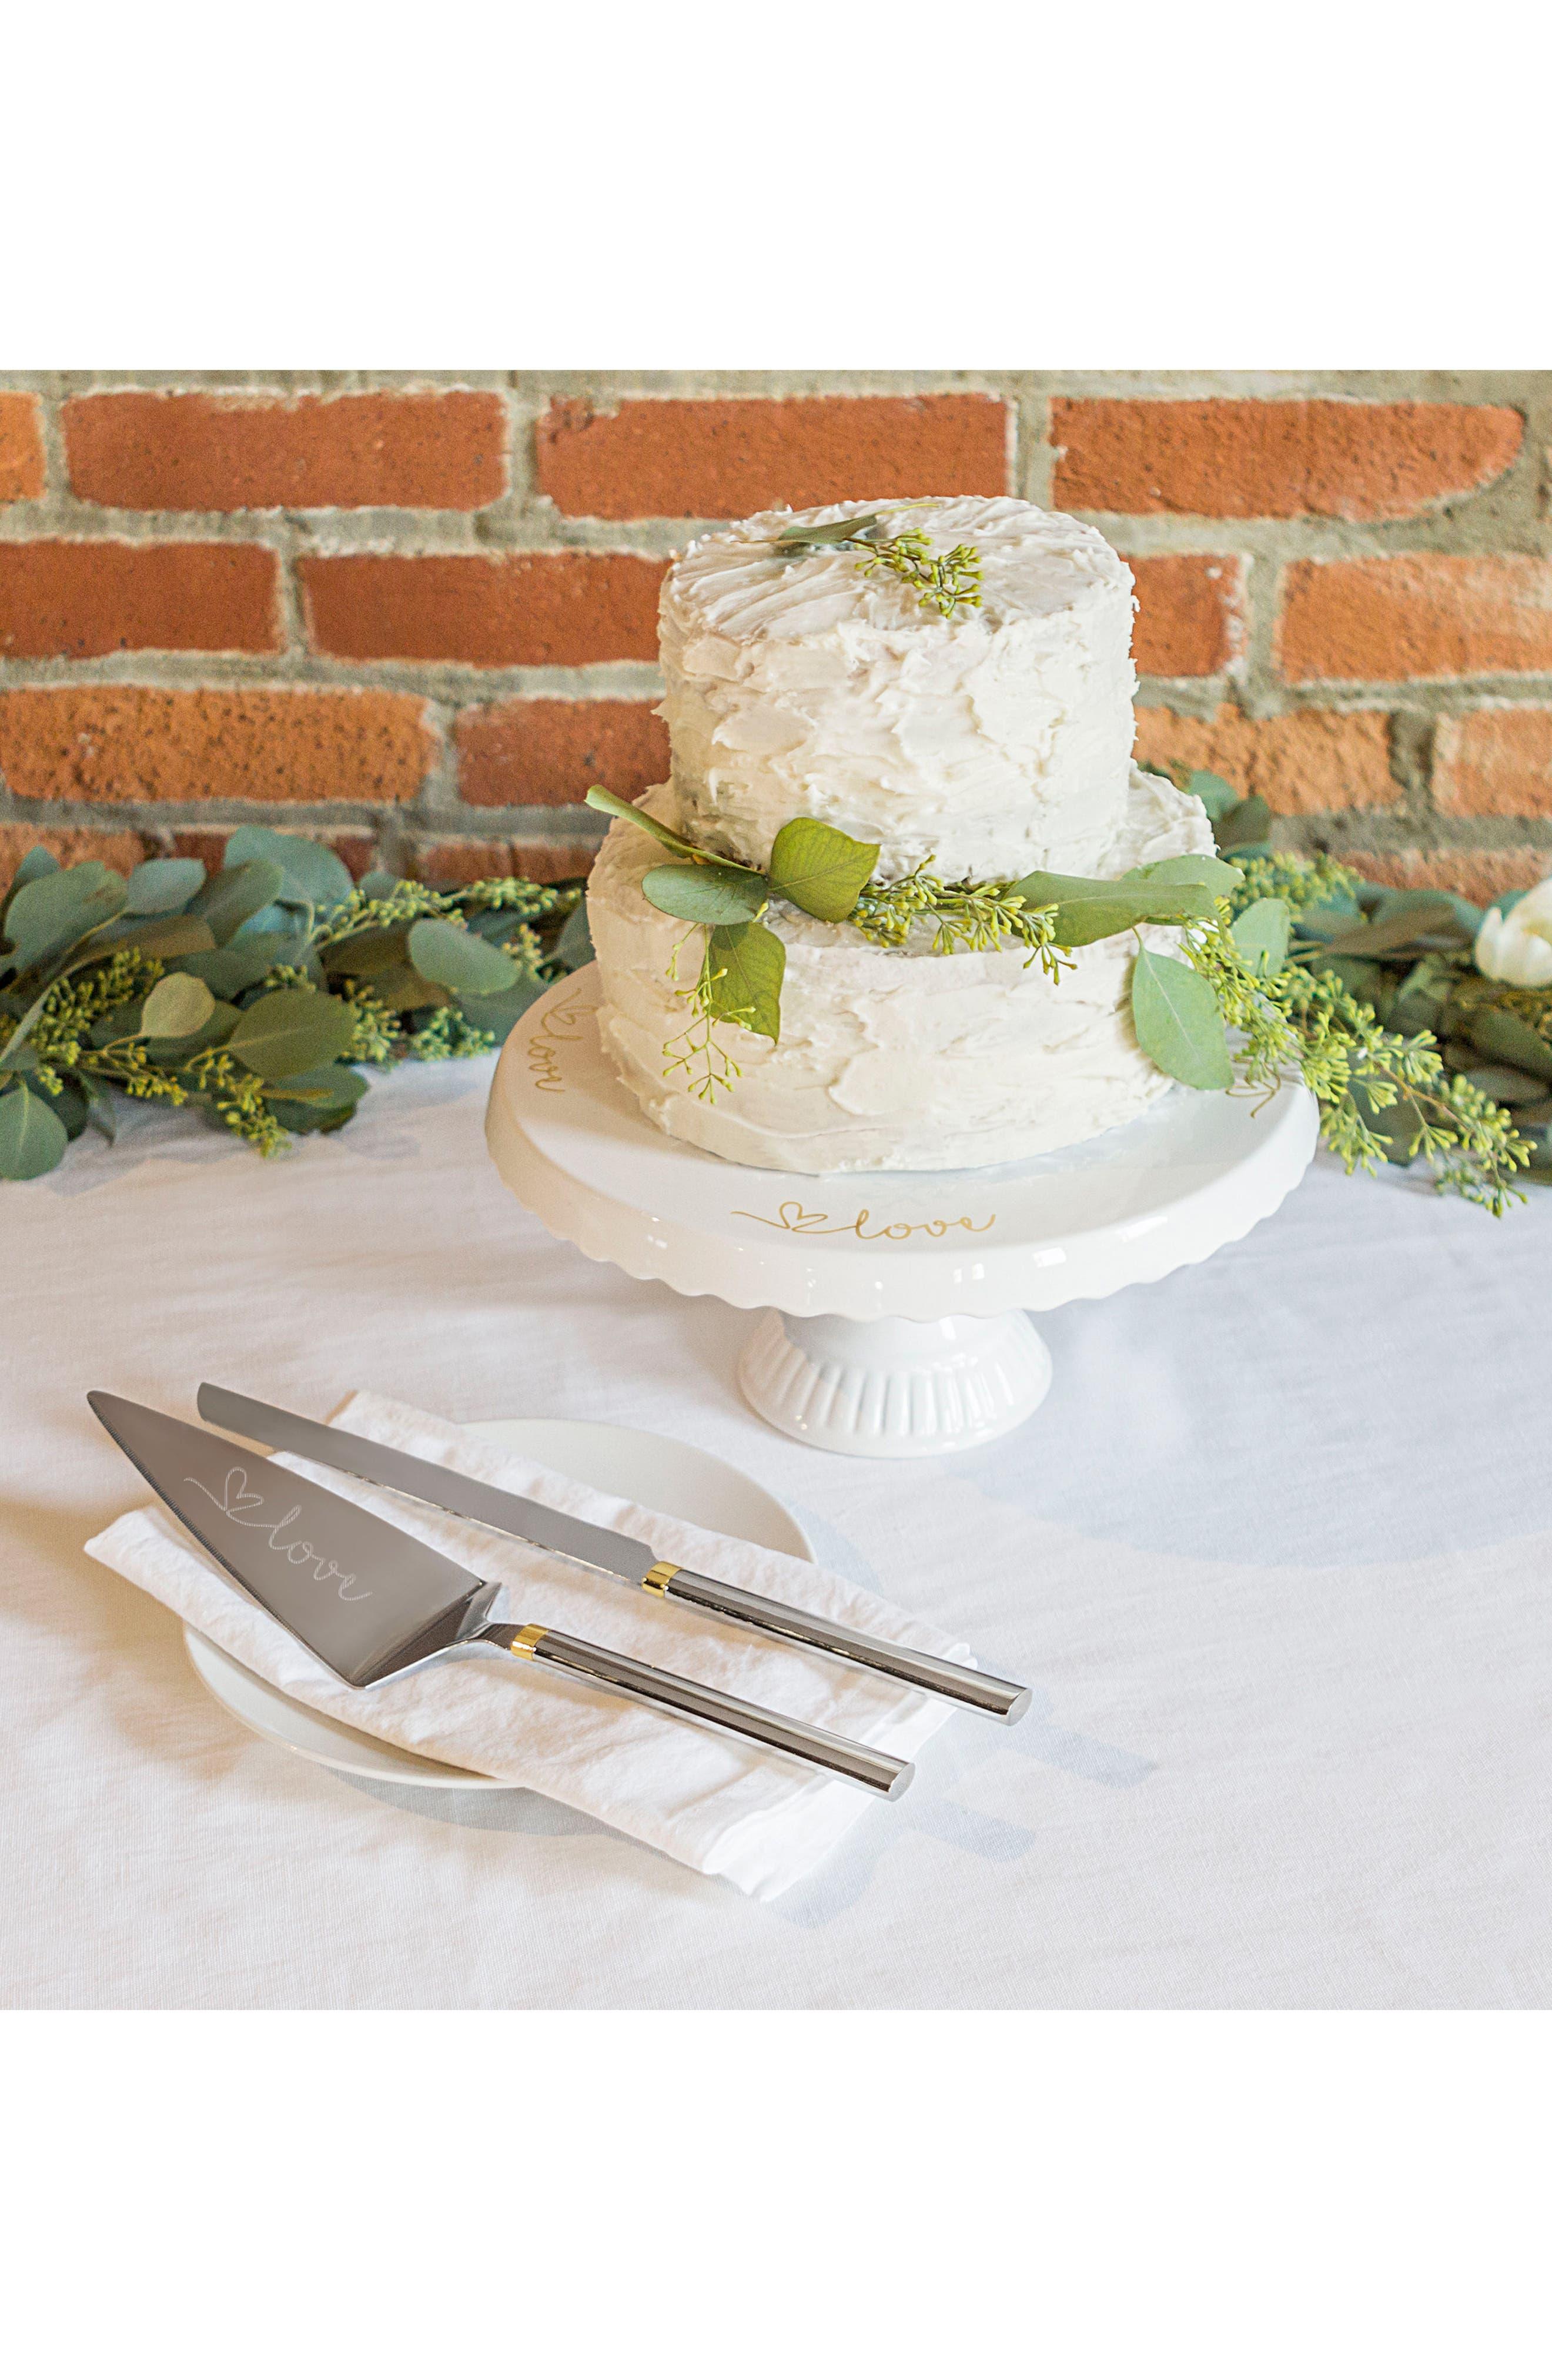 Love Monogram Cake Stand & Server Set,                             Alternate thumbnail 6, color,                             710